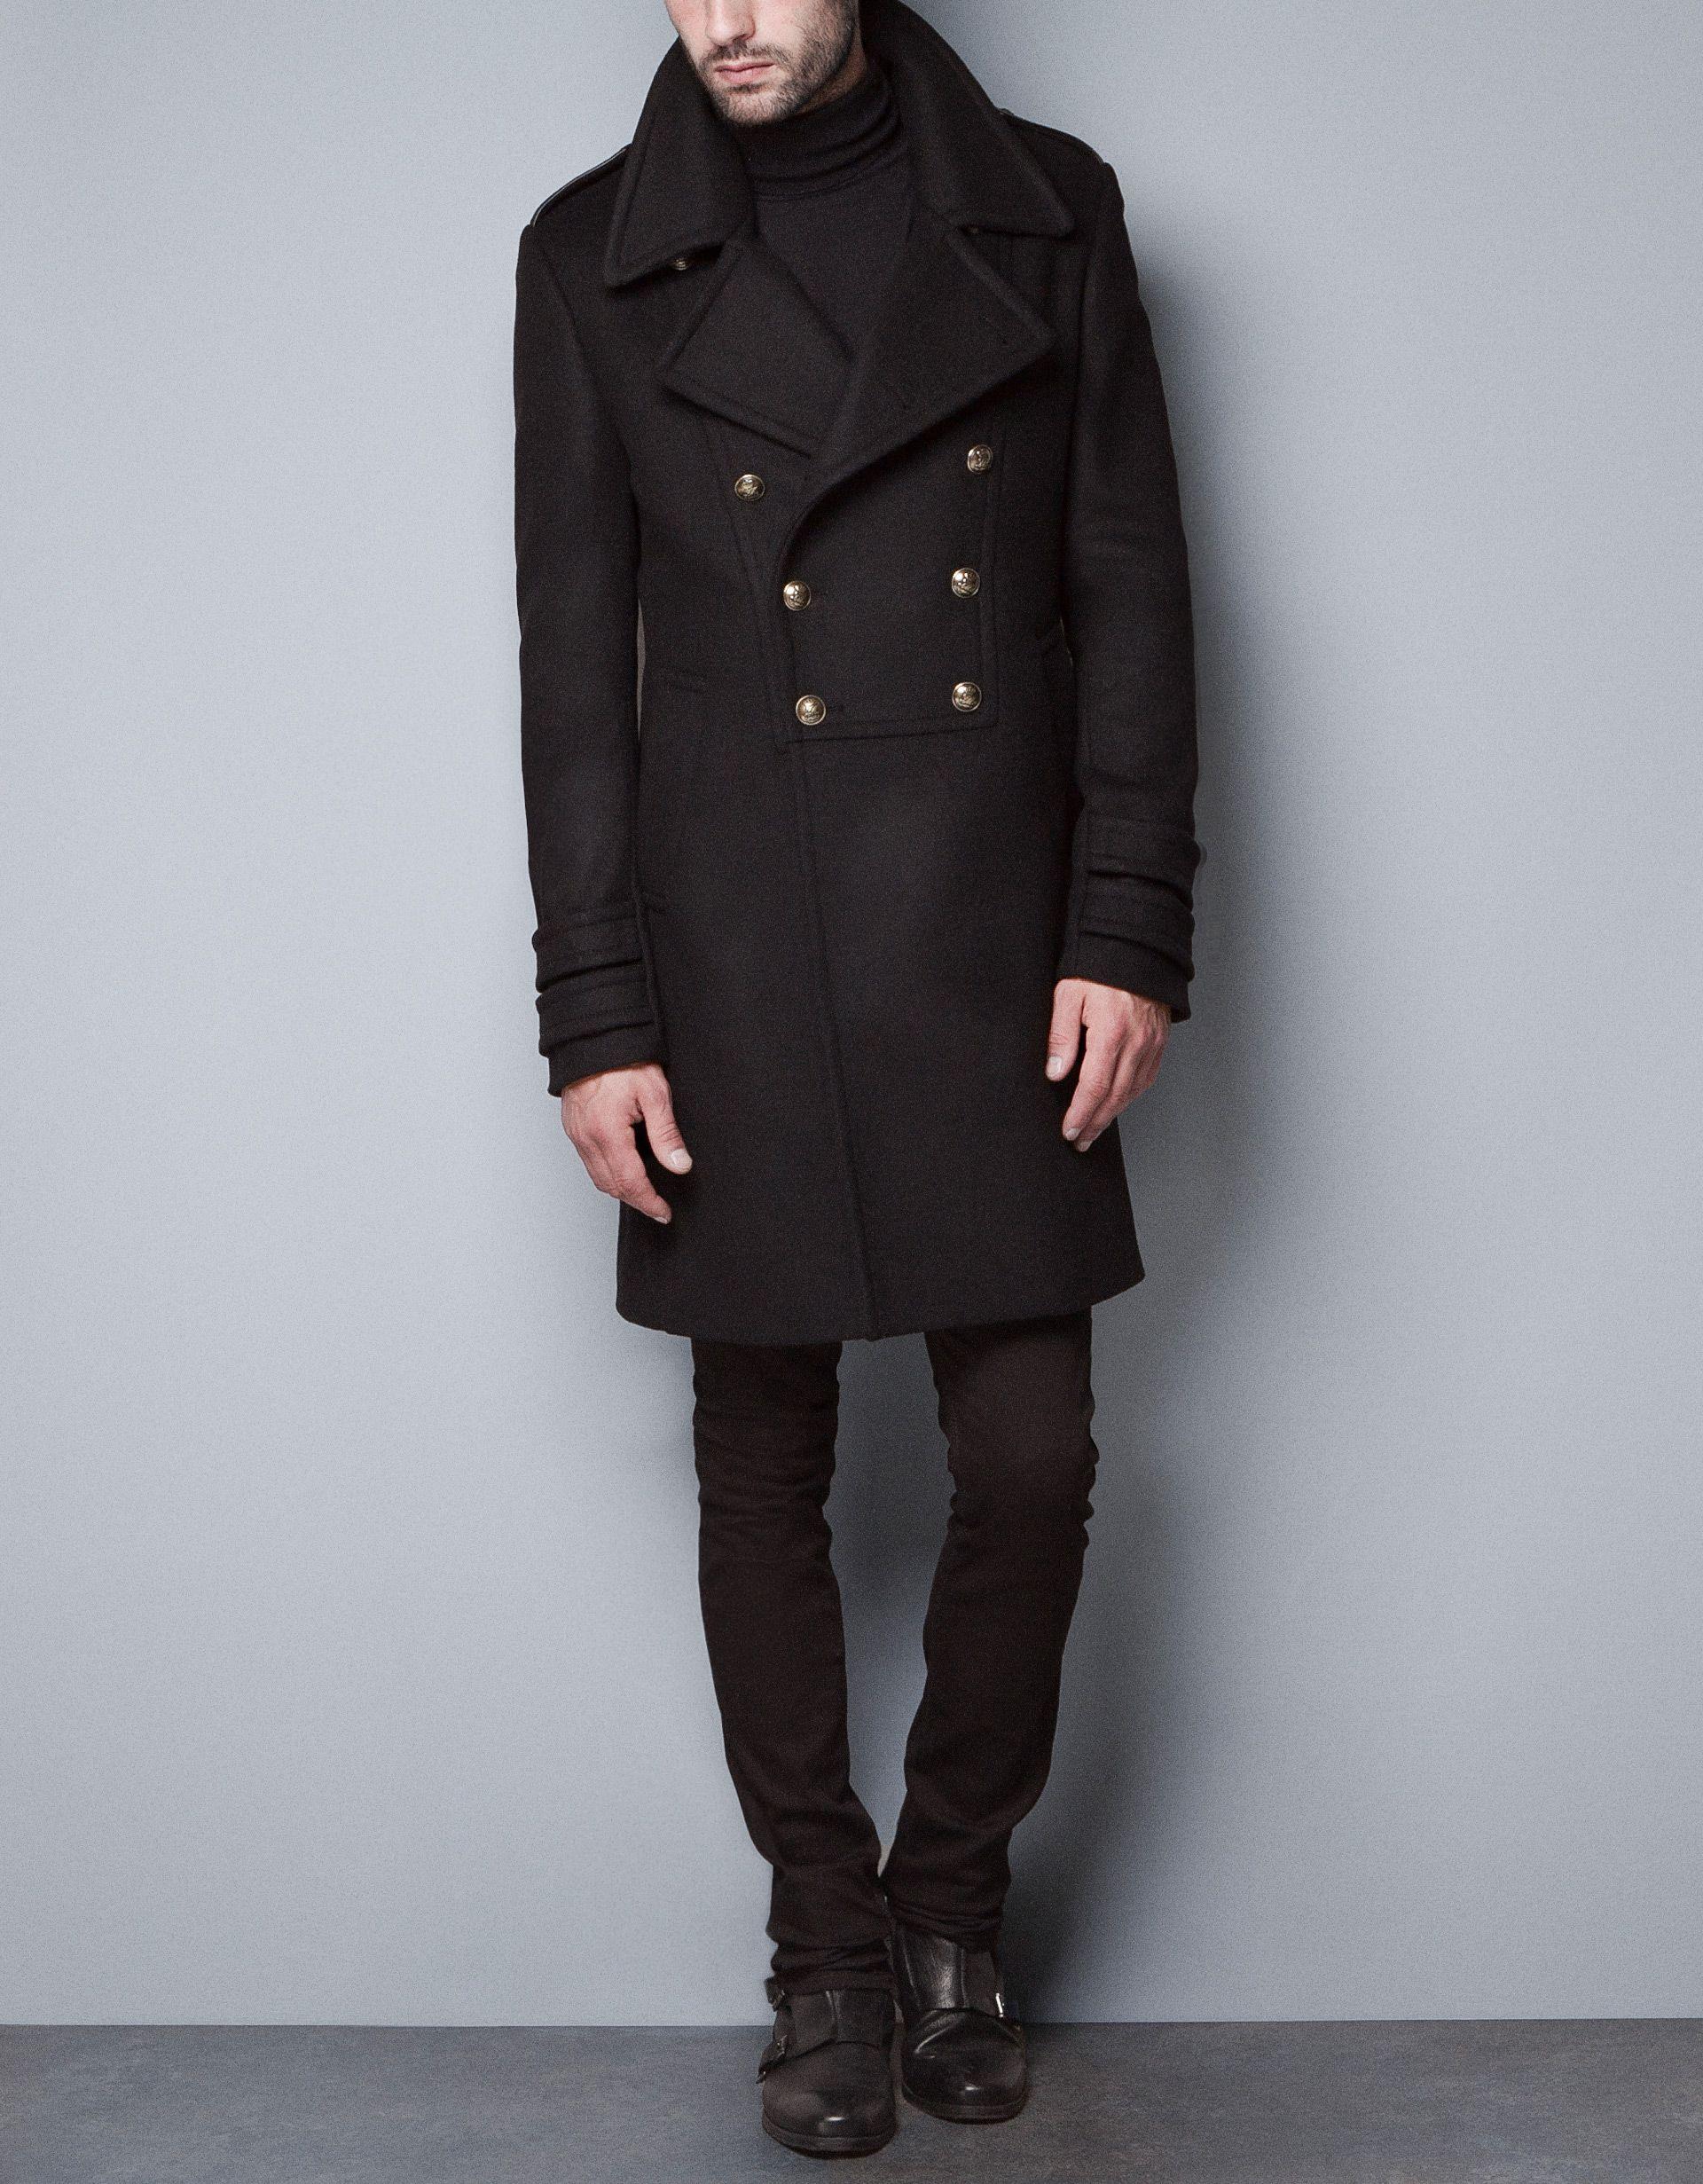 Men's Autumn/Winter Jackets- ZARA. i got it with 39.99 ...